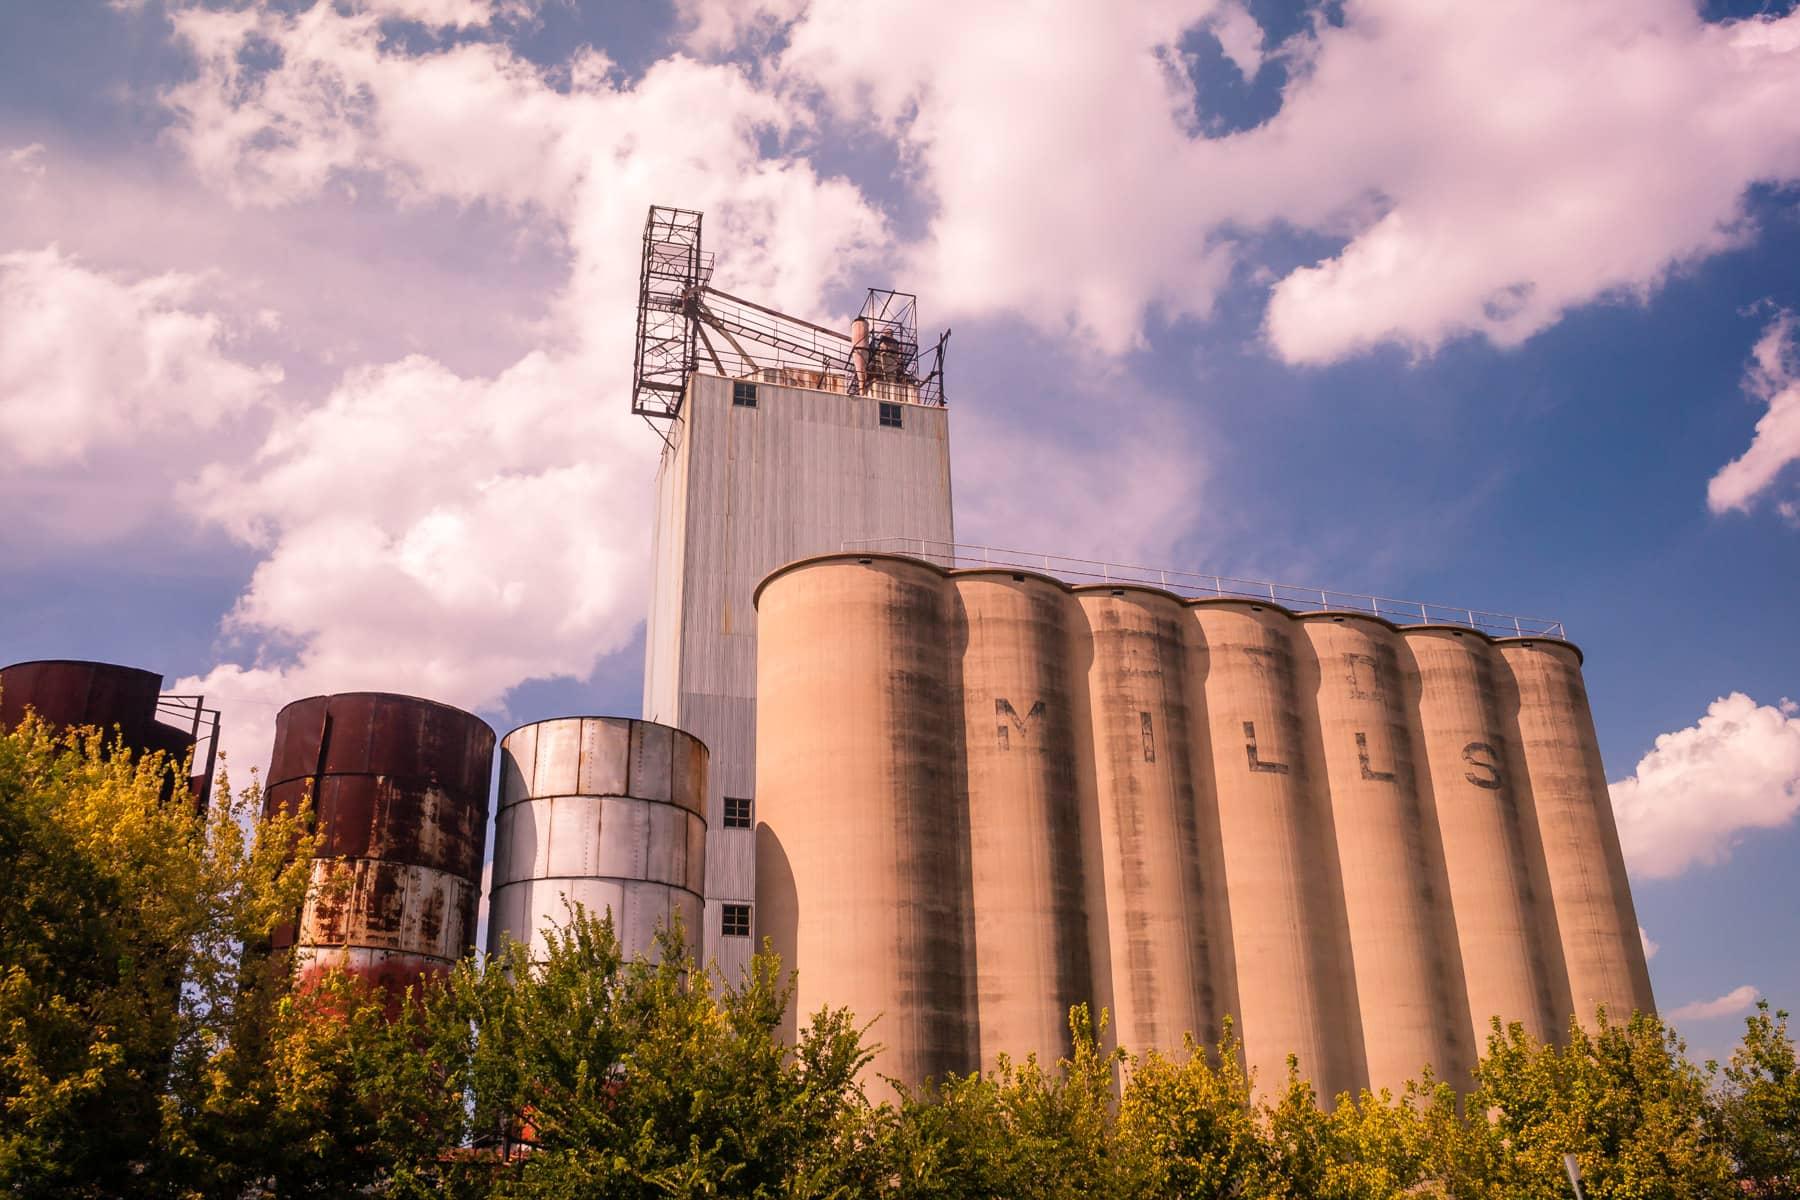 Grain silos rise into the cloudy sky in Grapevine, Texas.